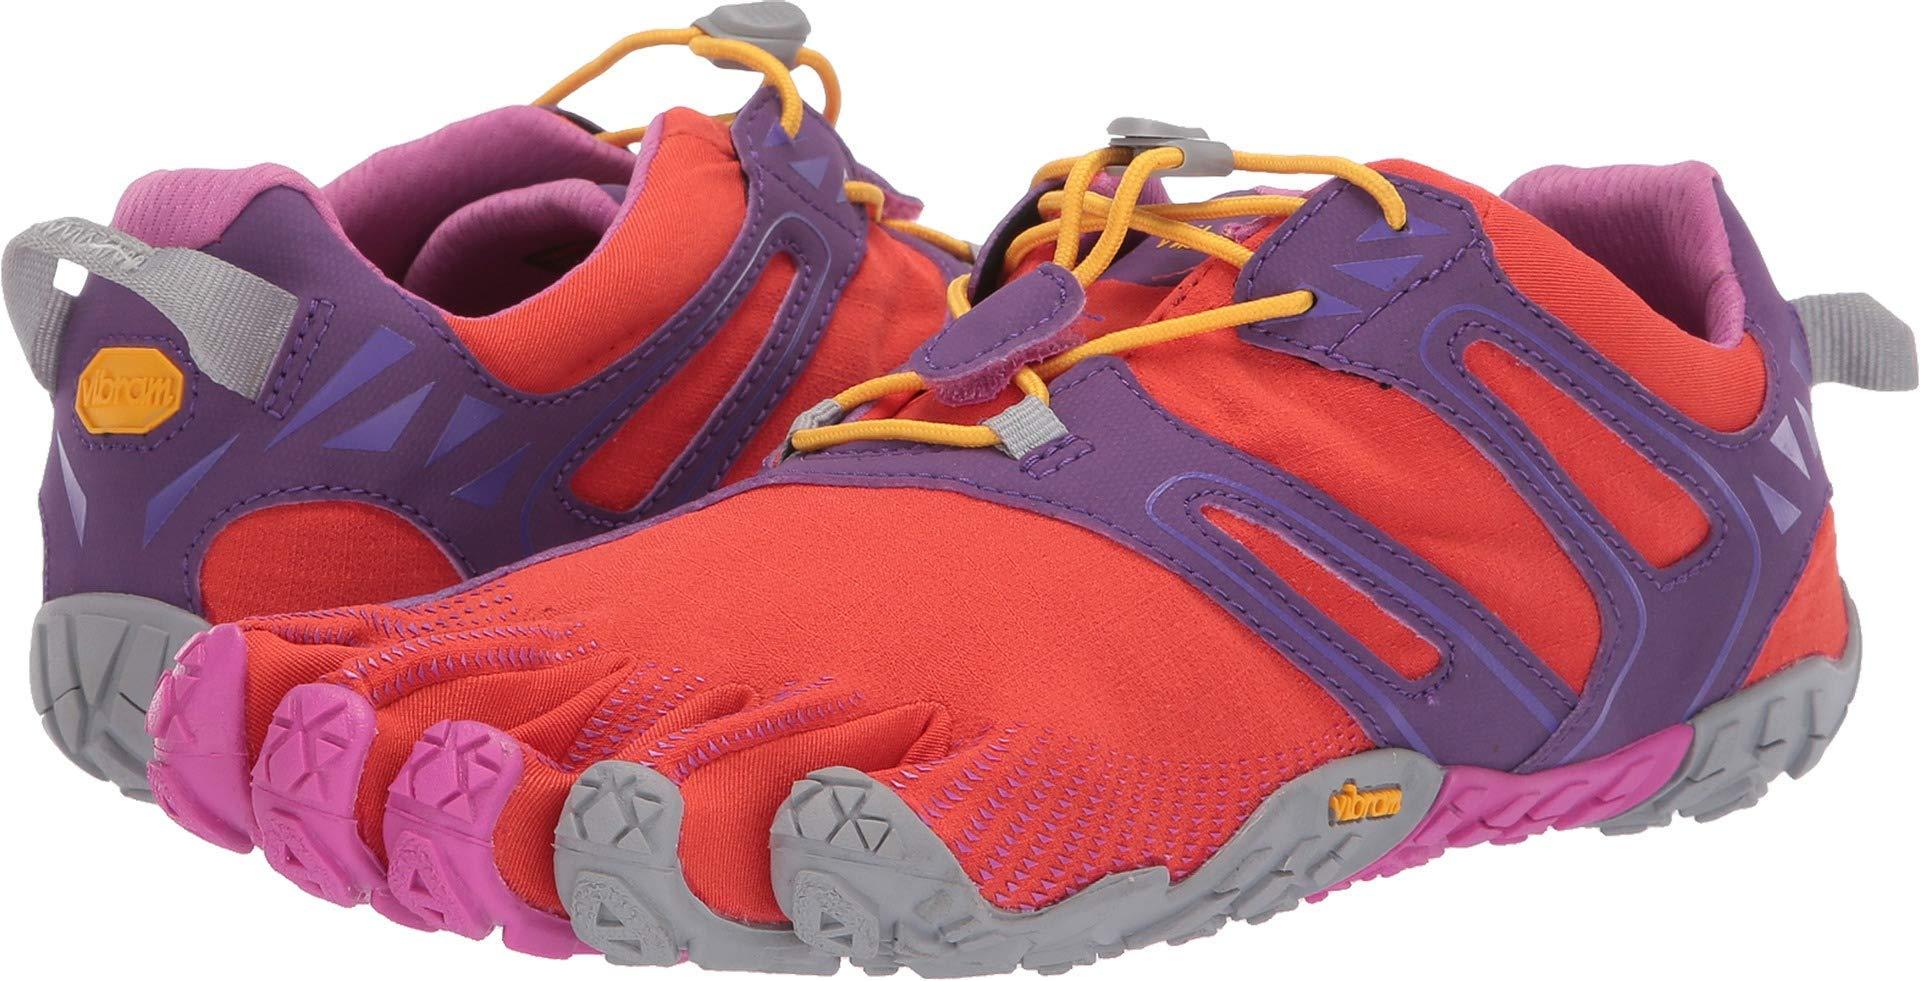 Vibram FiveFingers Women's V-Trail Barefoot Shoes Magenta/Orange 35